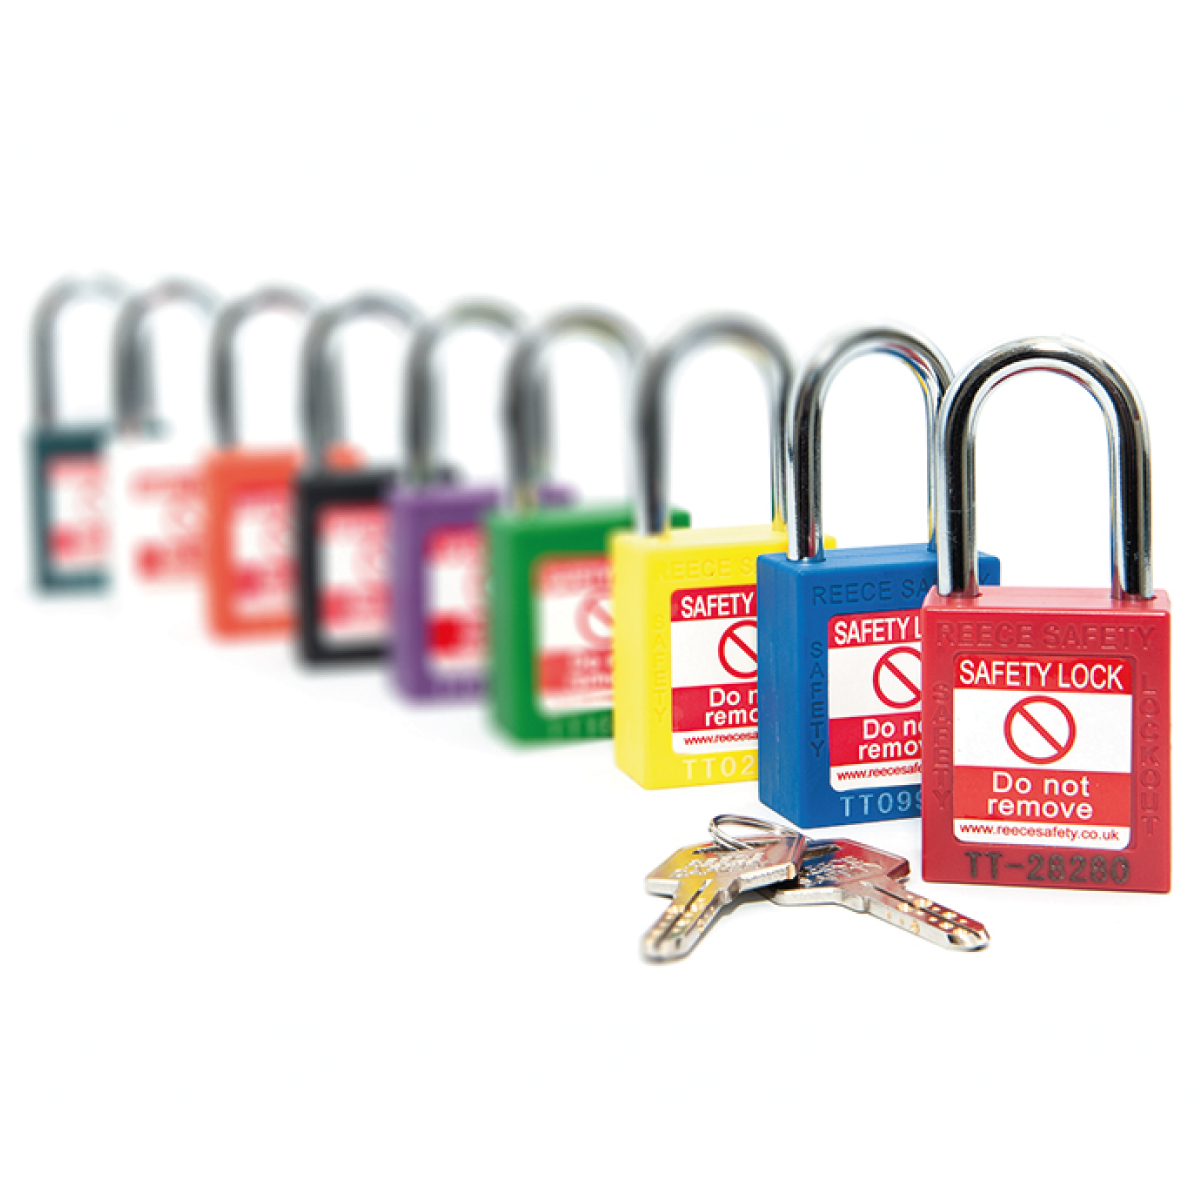 What makes the Reece nylon-bodied TT series padlock so good!